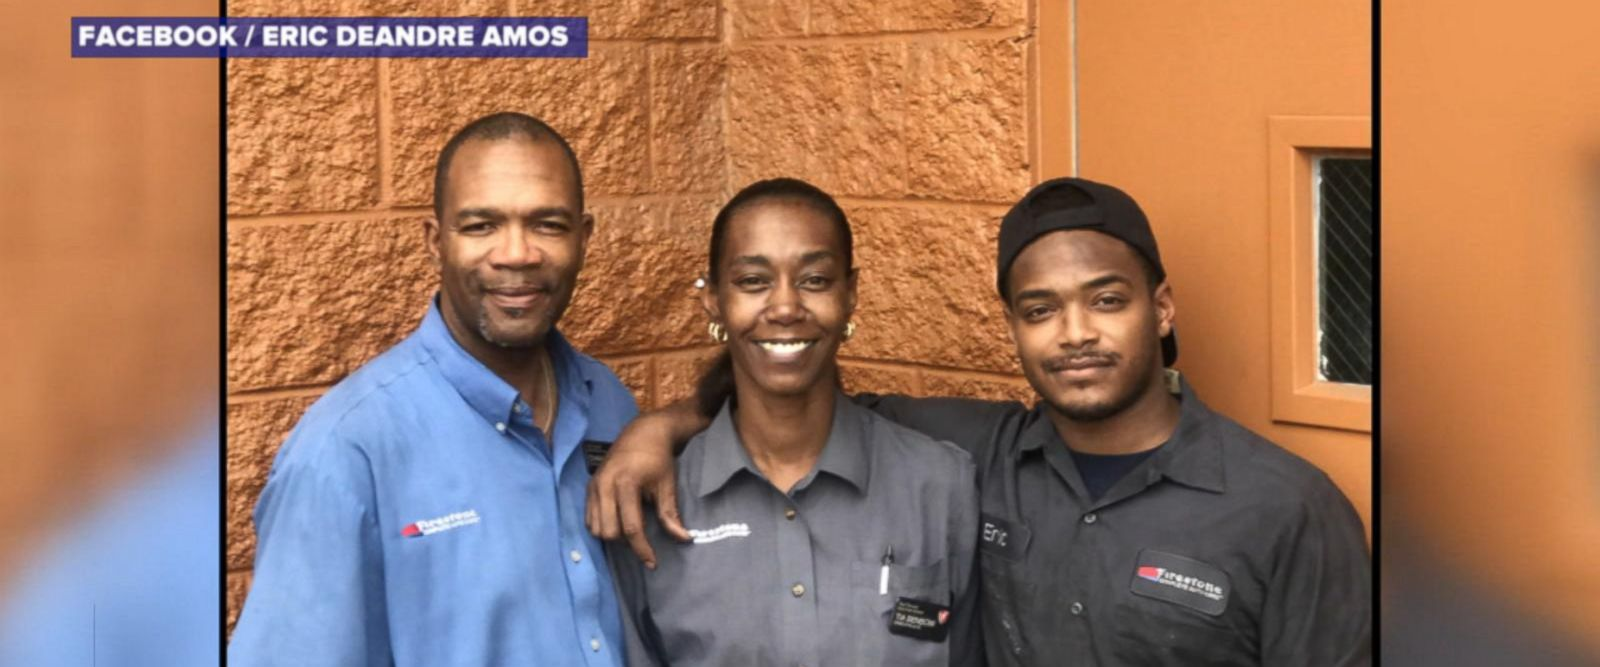 VIDEO: Boss, co-workers raise $1,300 to help Firestone teammate keep long-distance job